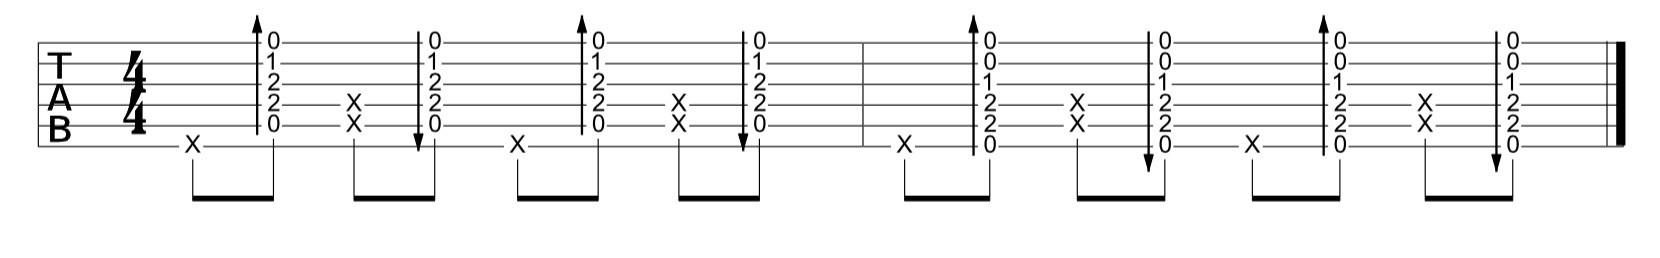 Chord-Percussion-1a